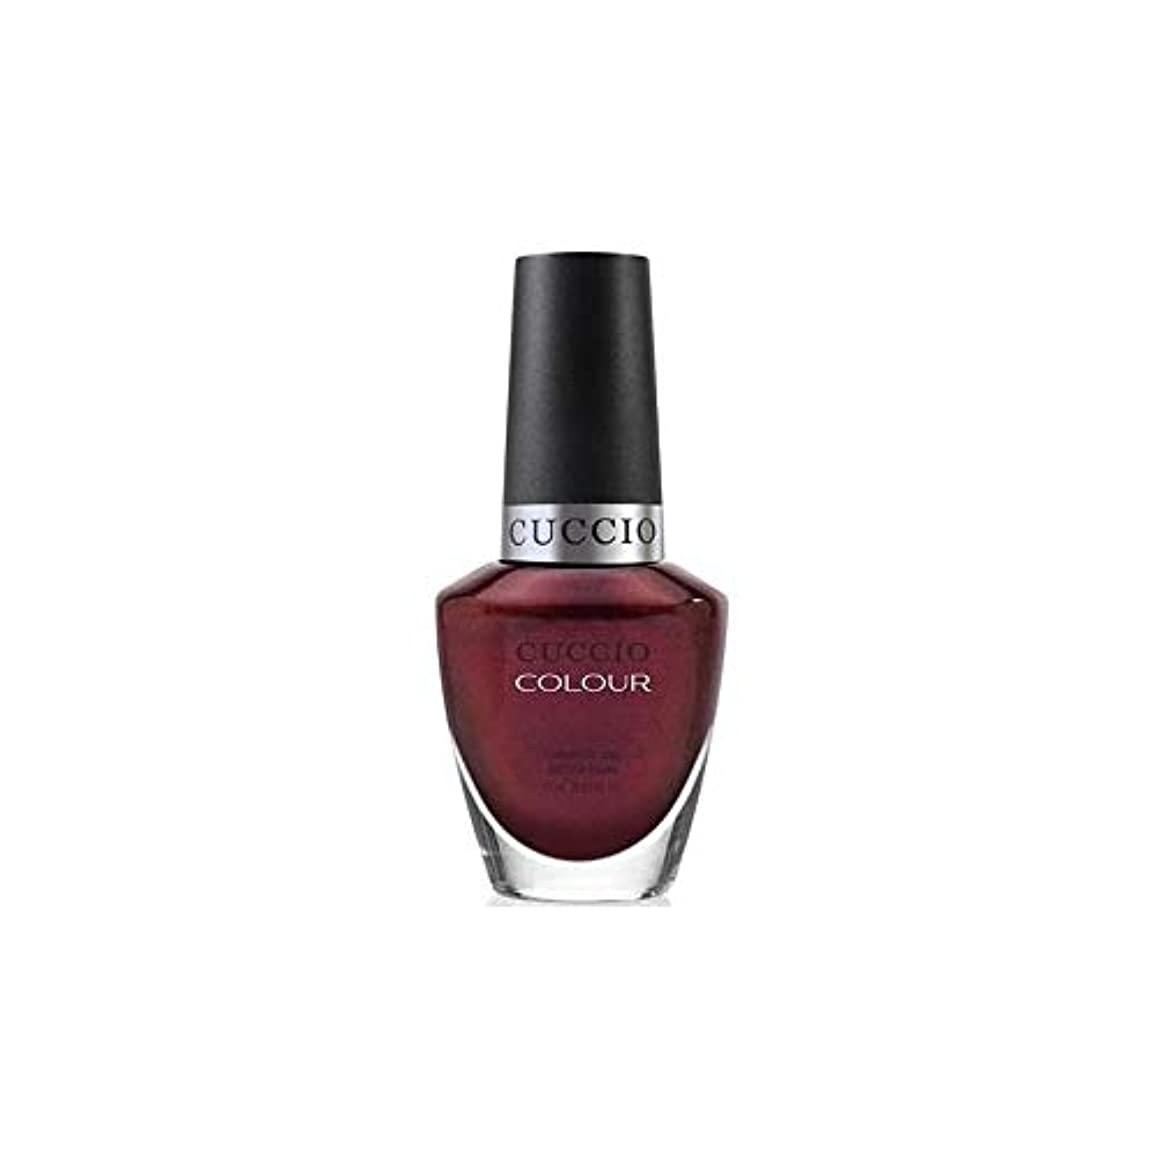 Cuccio Colour Gloss Lacquer - Royal Flush - 0.43oz / 13ml